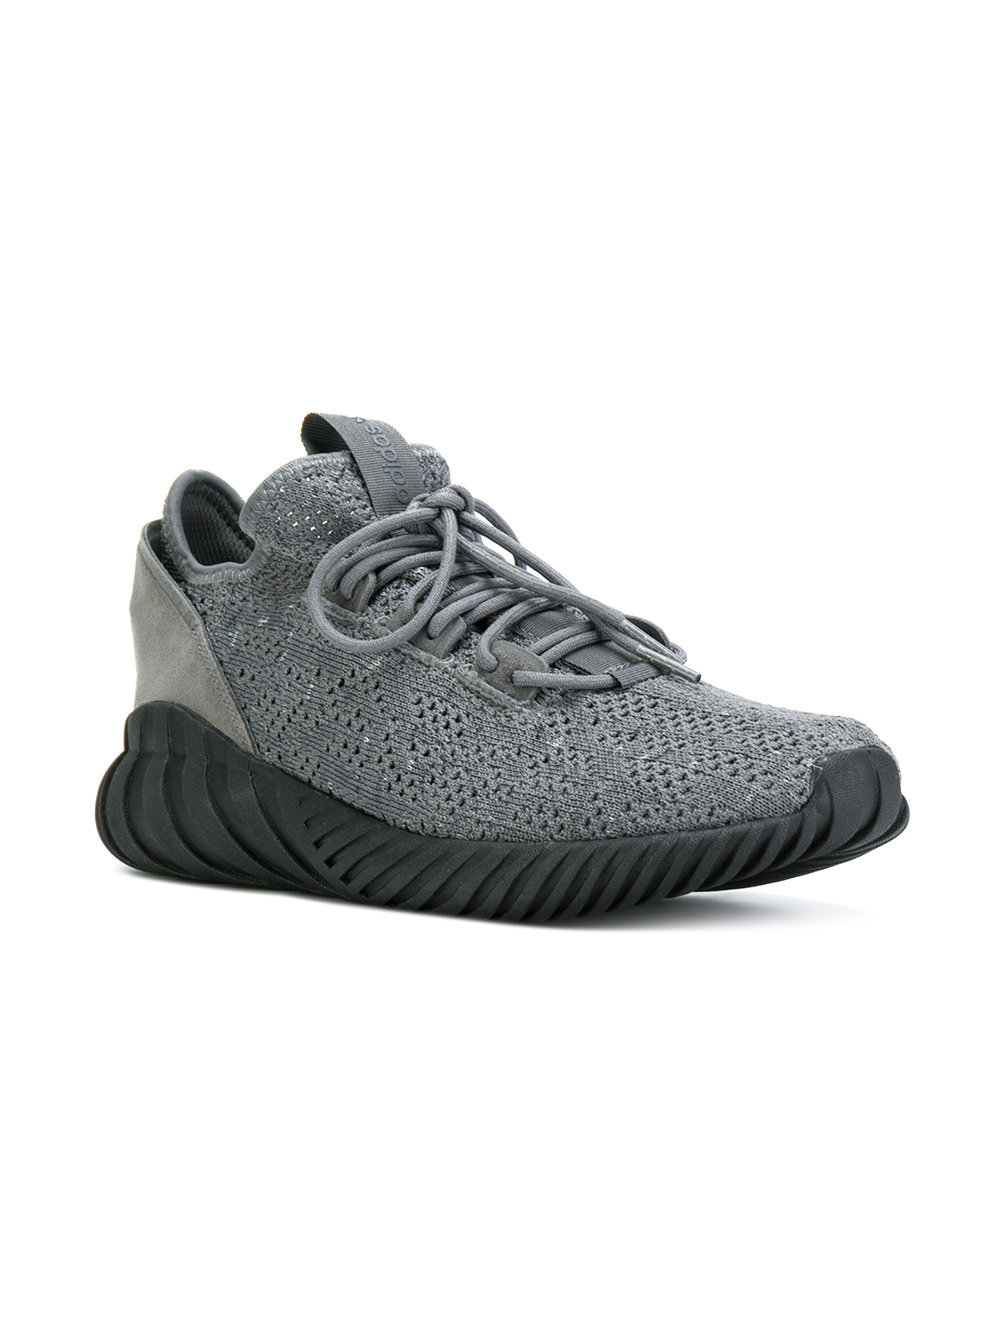 best website 4bbd4 195da £188, adidas Originals Tubular Doom Sock Primeknit Sneakers